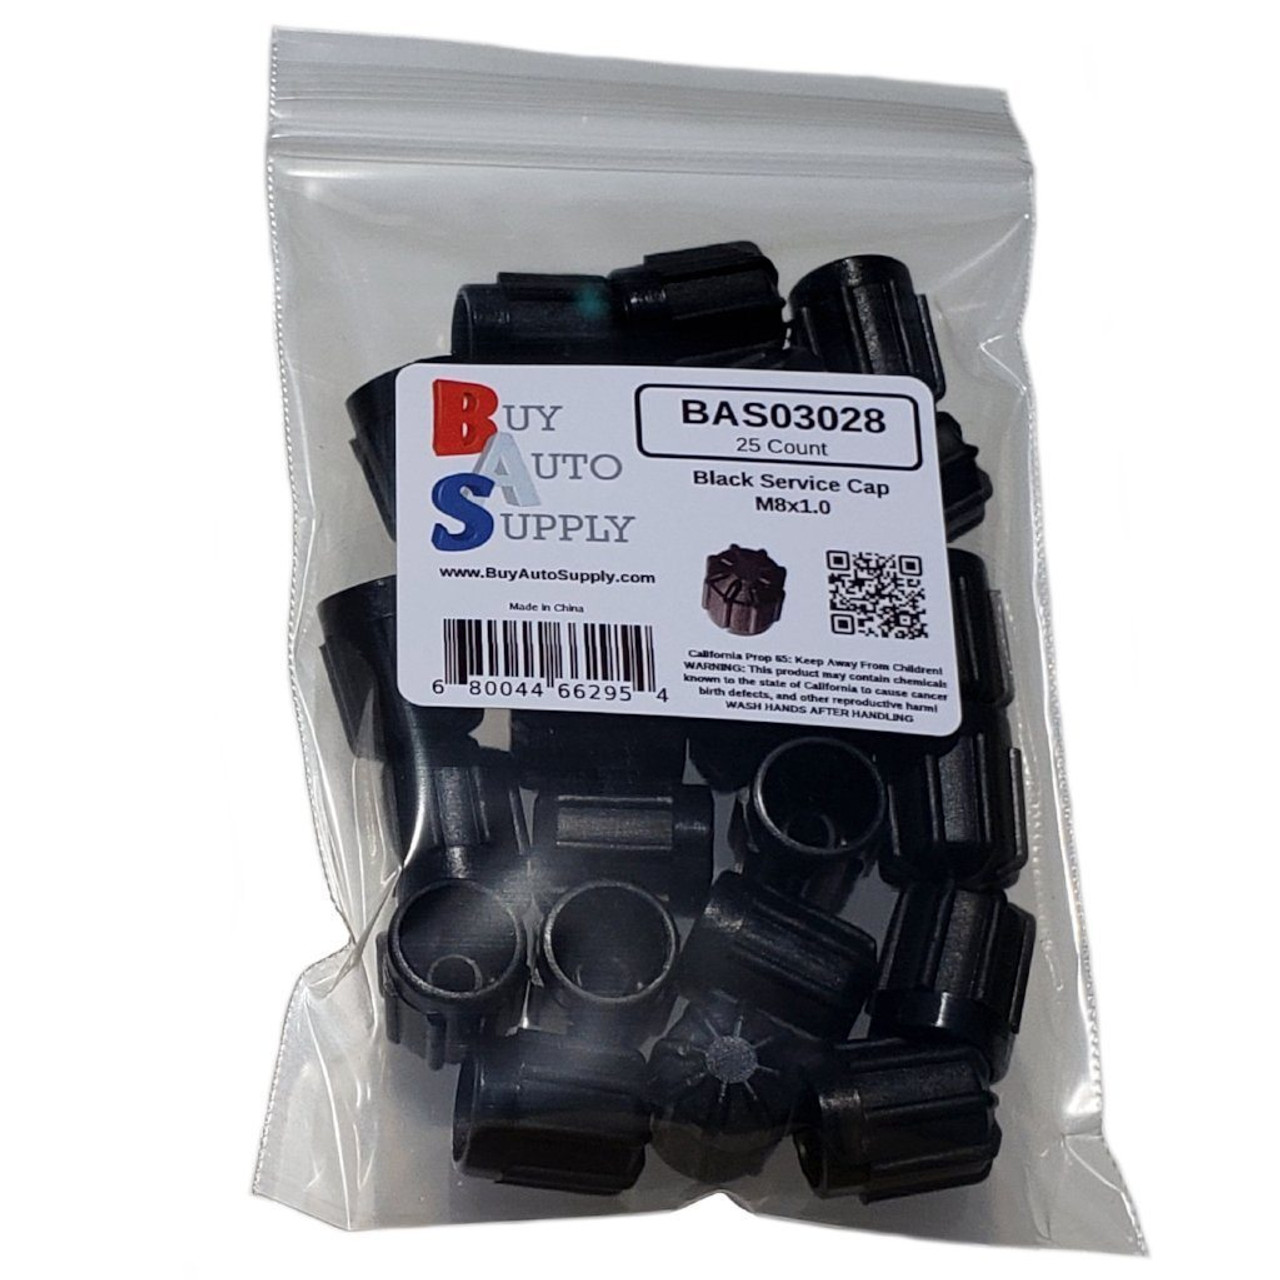 Bag of 25 M8x1.0 AC Service Valve Caps Interchanges: BMW 64538387437, Delco 15-5457, GM 25613359